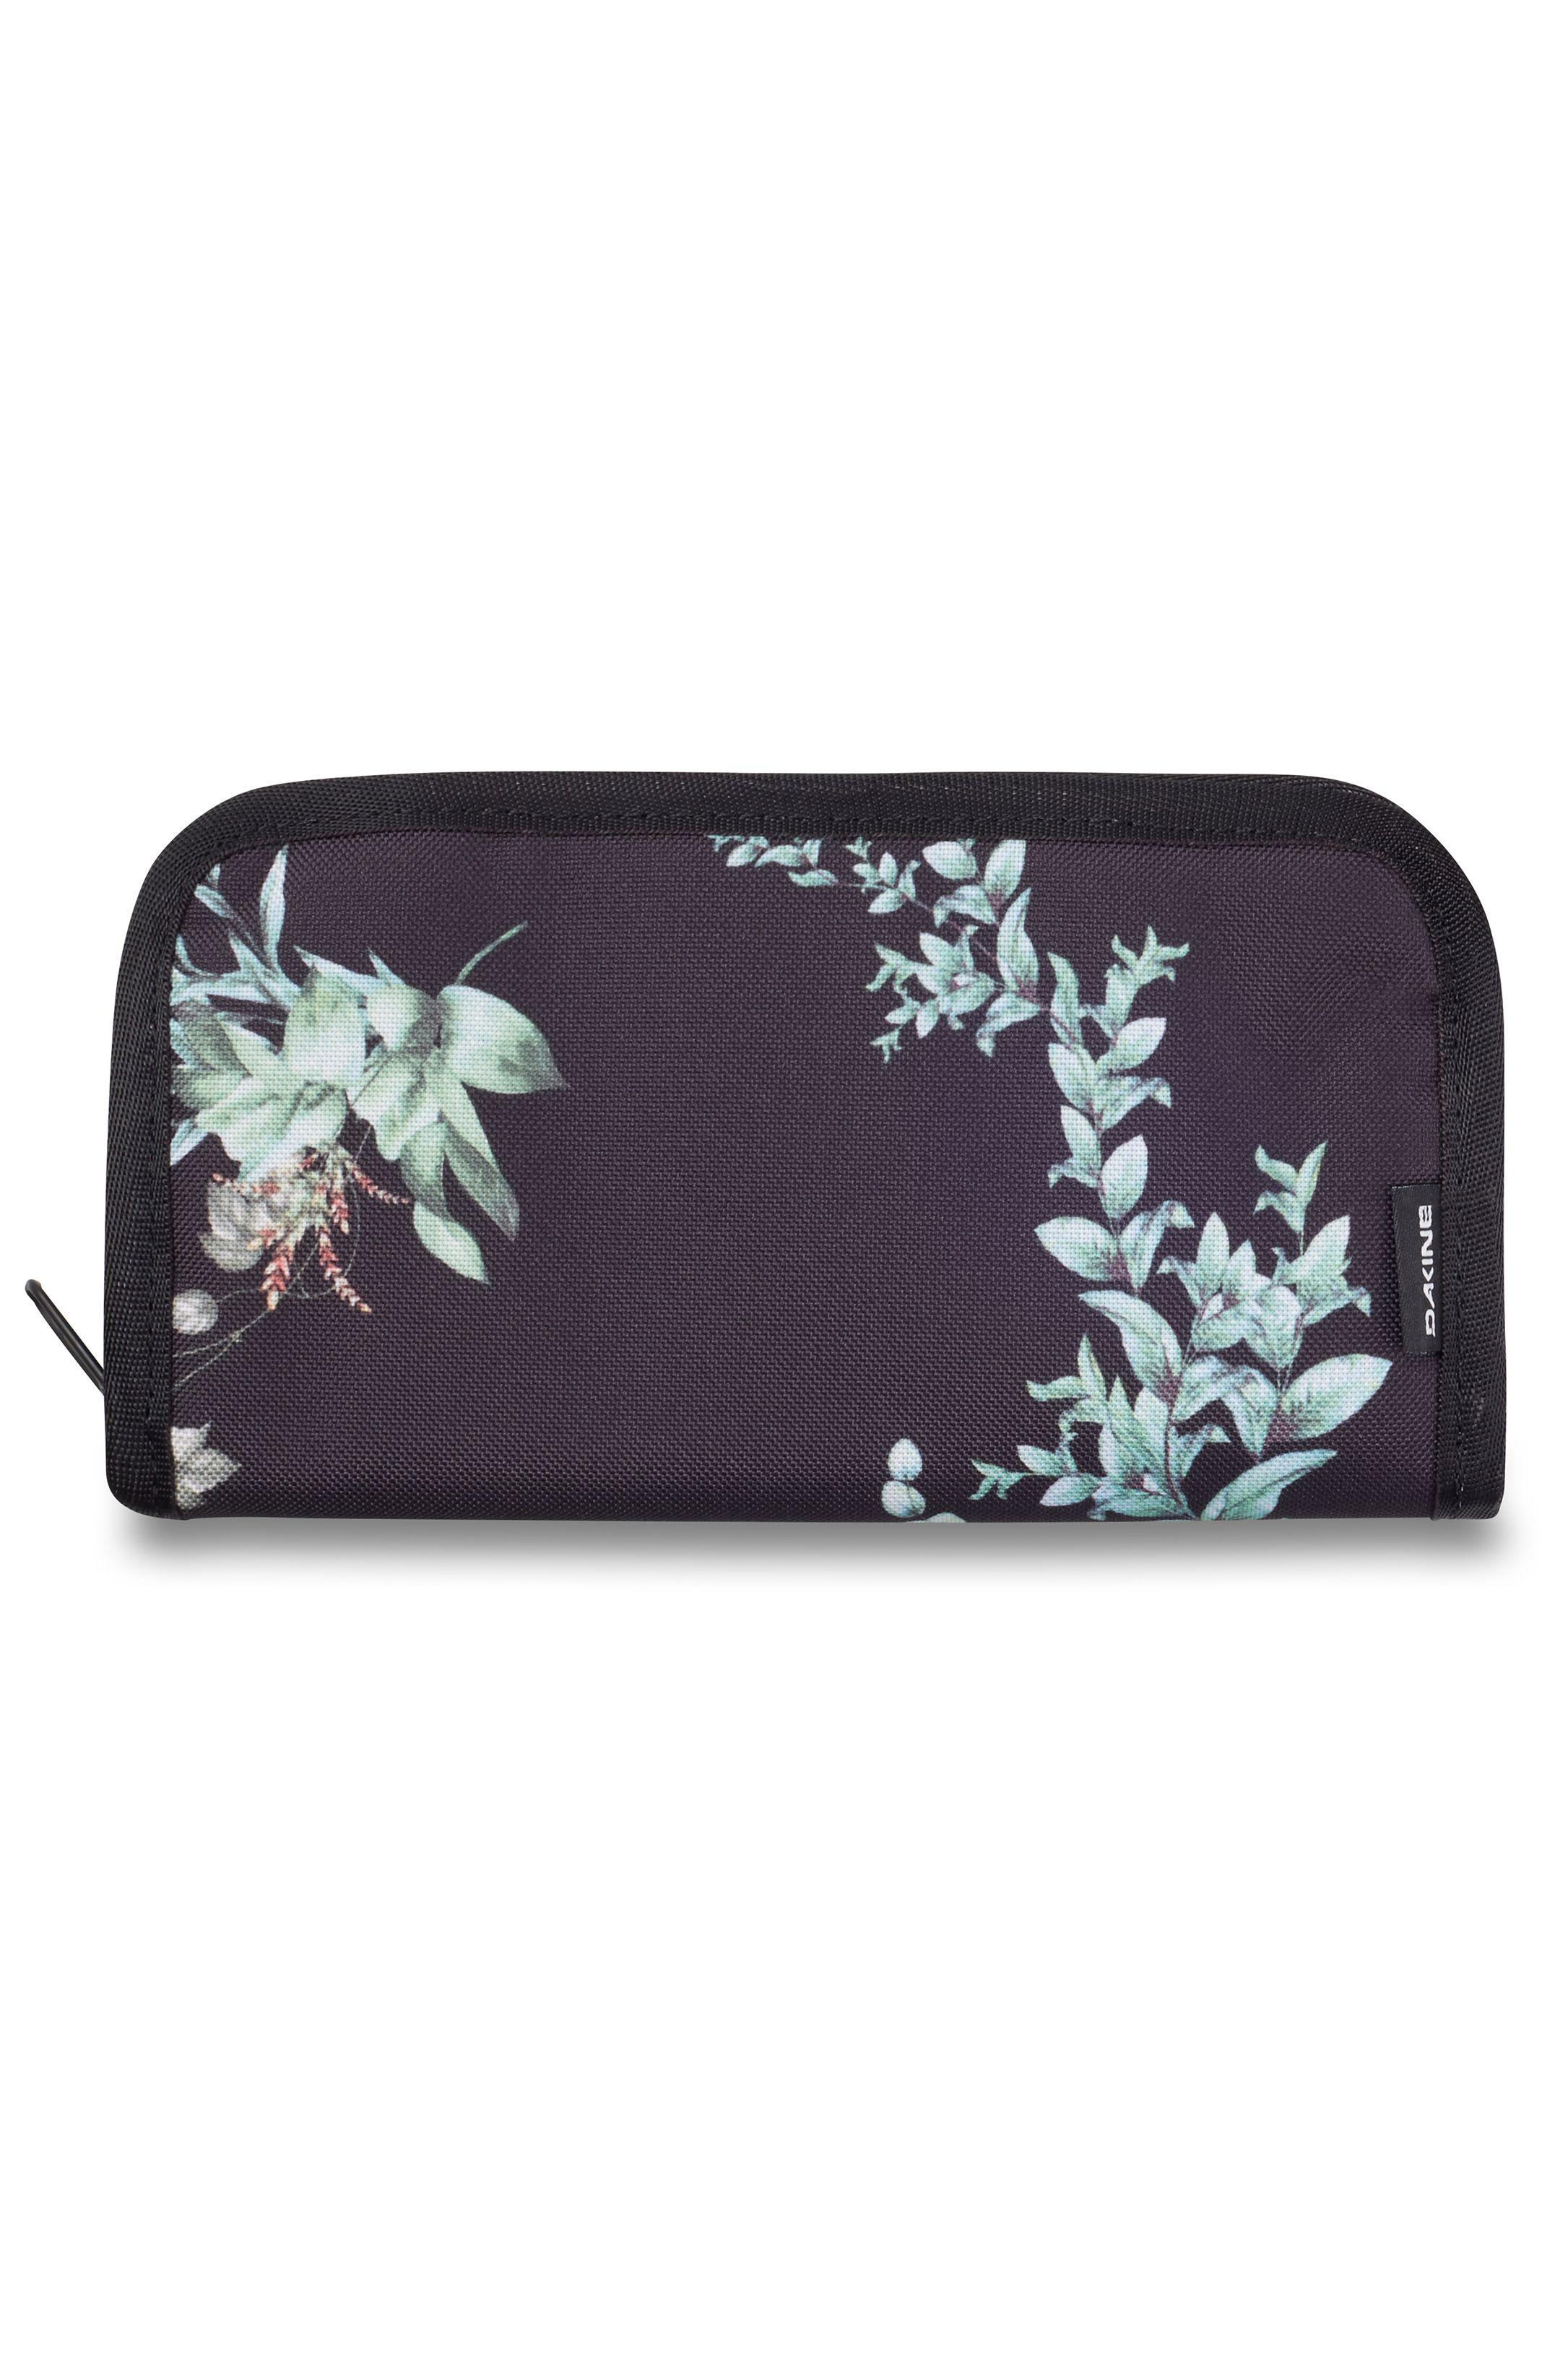 Dakine Wallet LUNA WALLET Solstice Floral